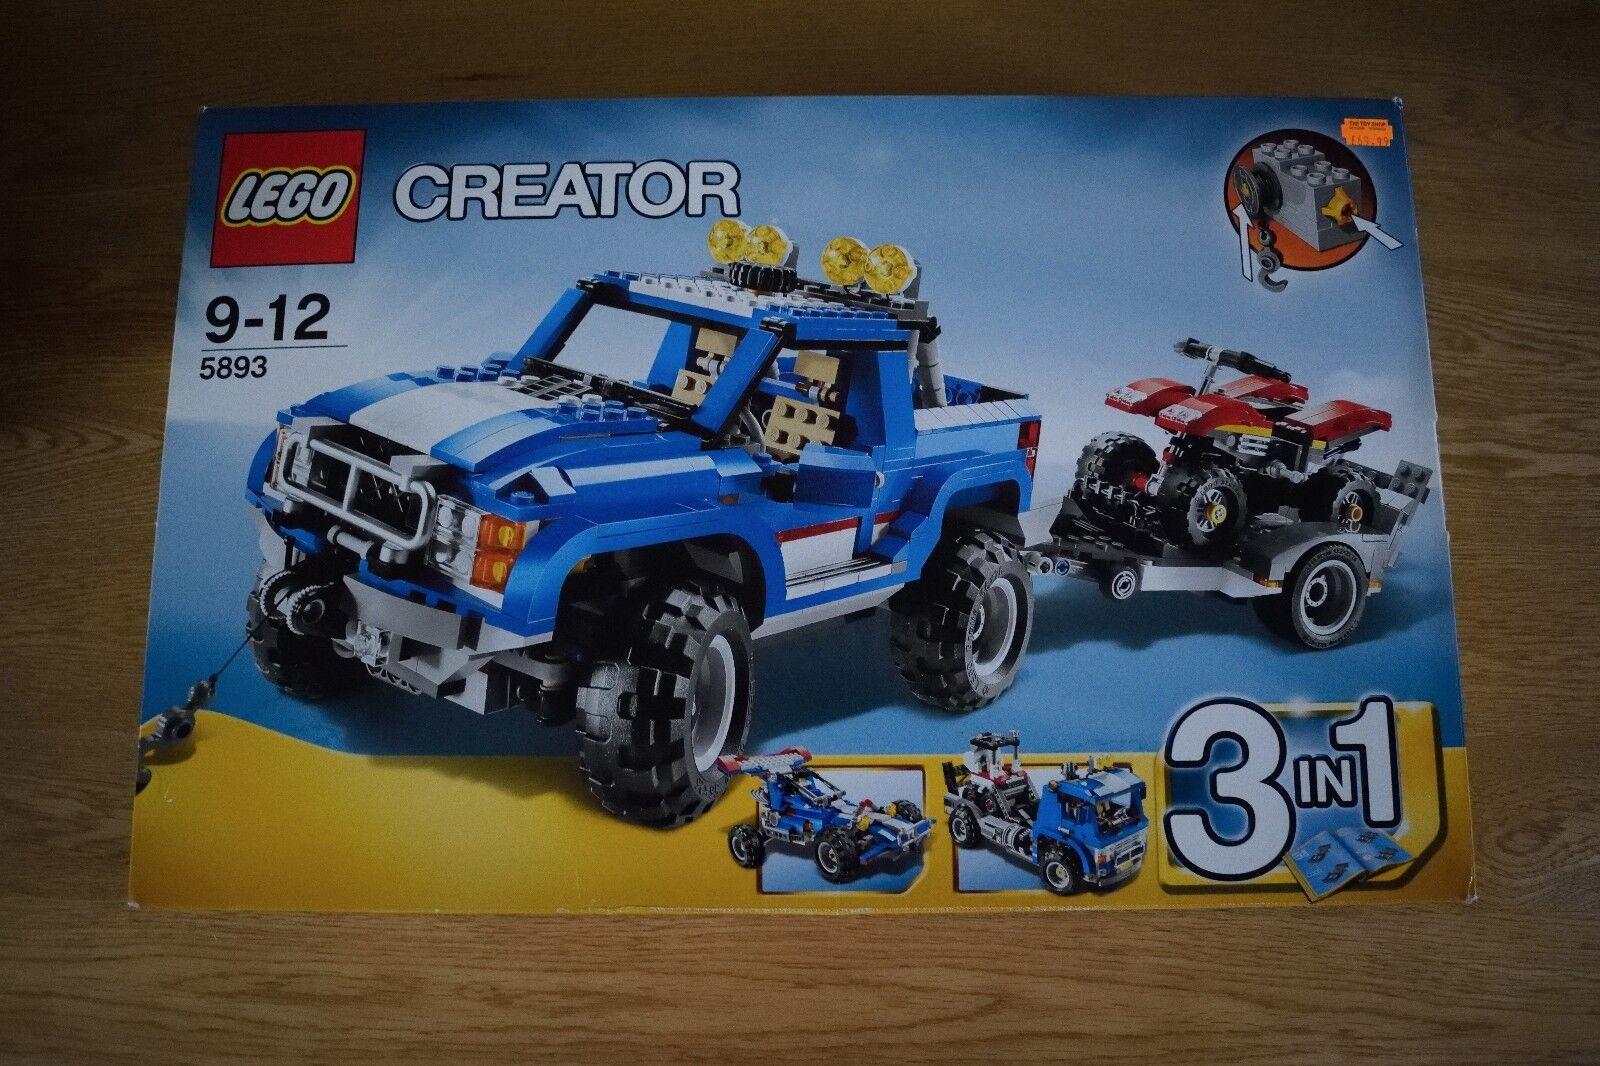 LEGO Creator Bleu Camion   3 en 1   Set 5893 - 100% complet